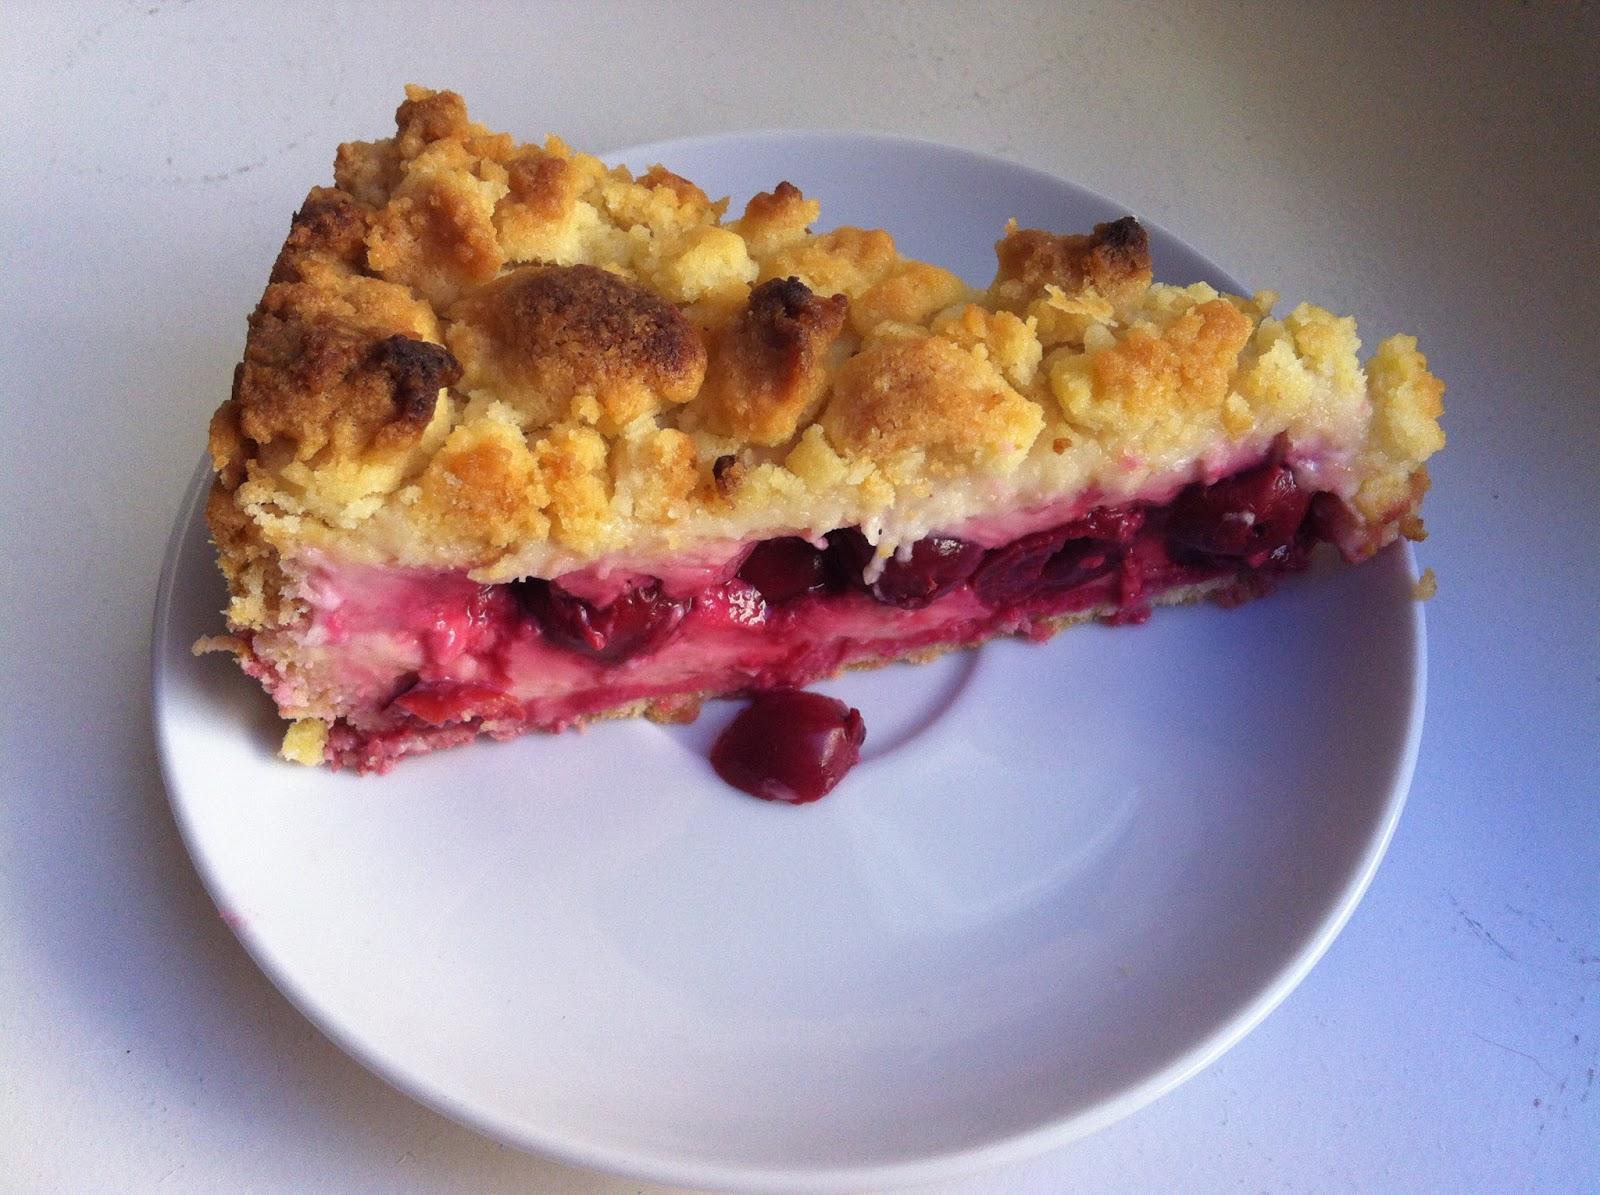 Melanies Backzauber Kirsch Streusel Mit Vanille Pudding